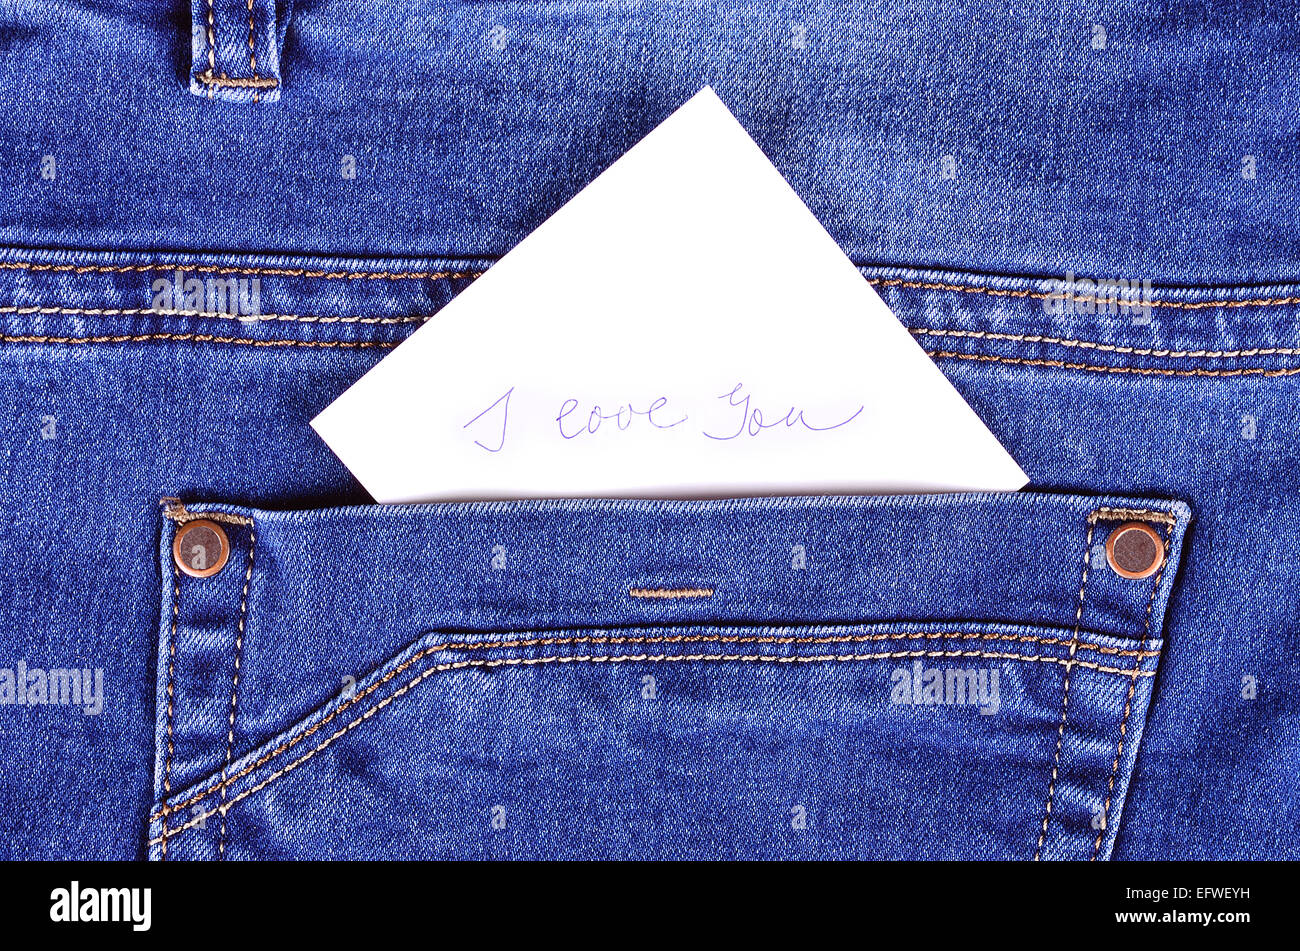 Sticker in back pocket blue jeans, detail - Stock Image